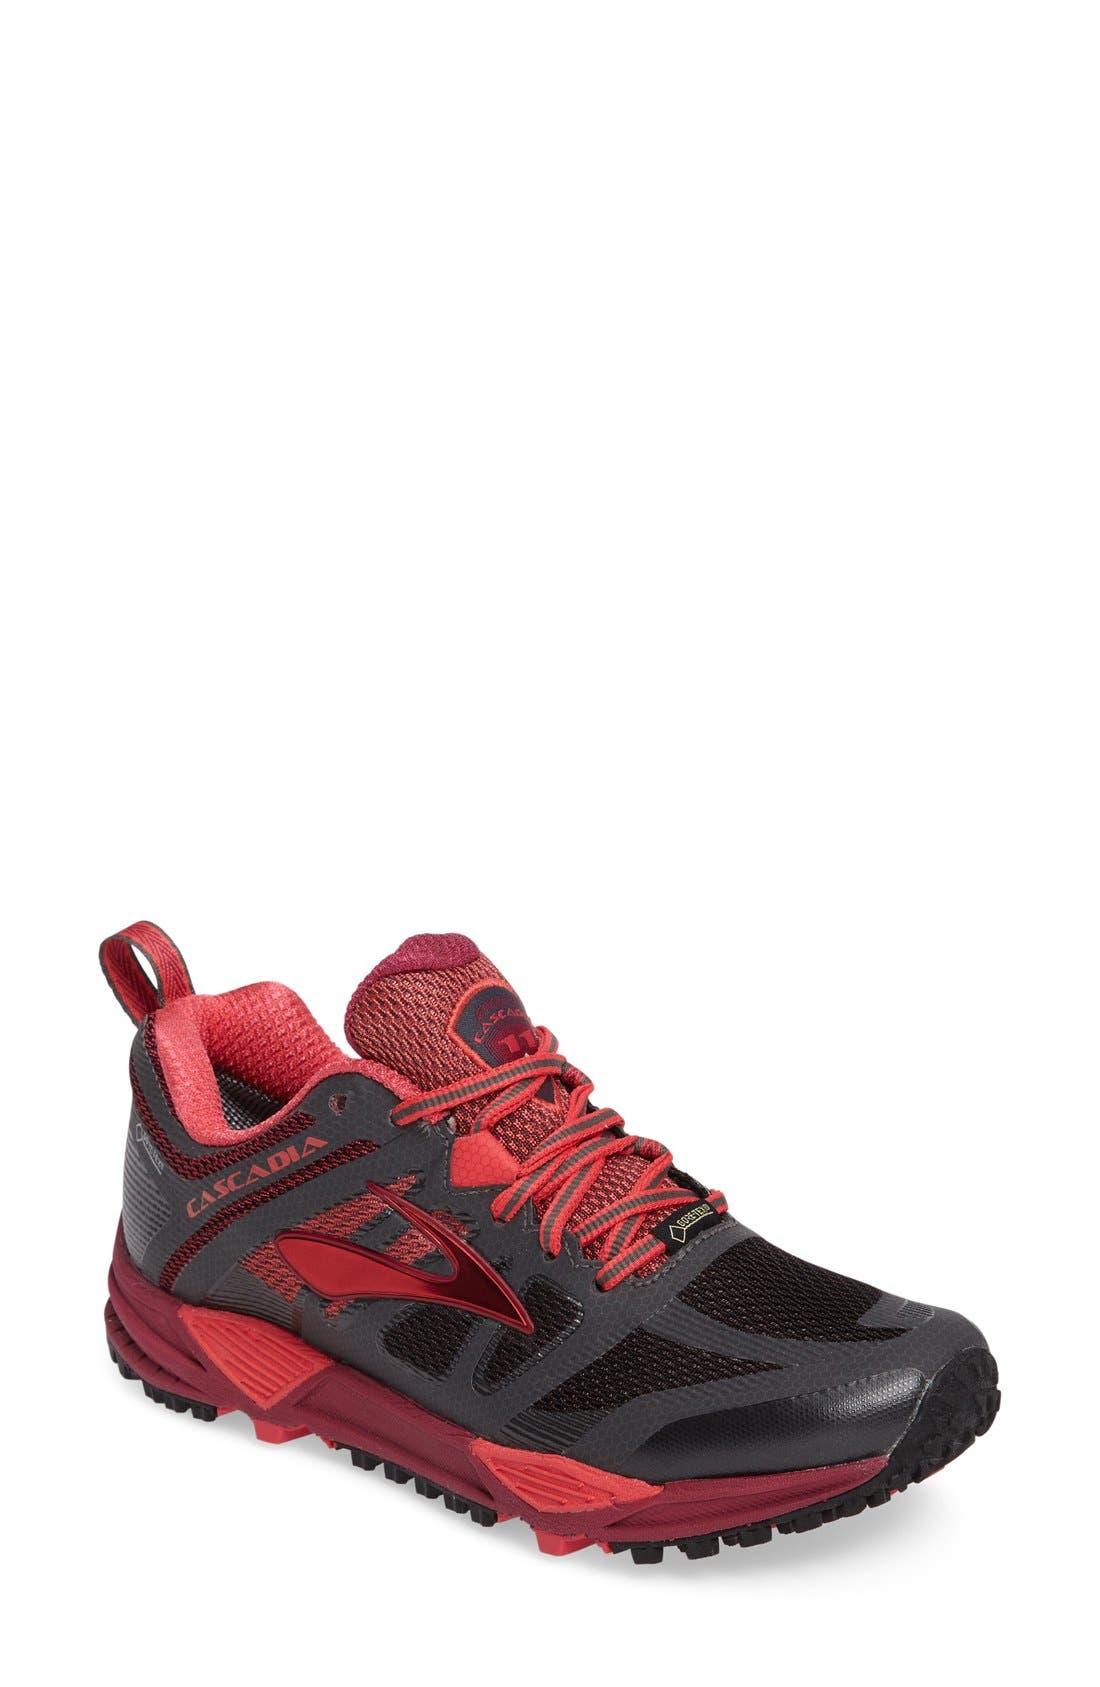 Cascadia 11 GTX Trail Running Shoe,                             Main thumbnail 1, color,                             020